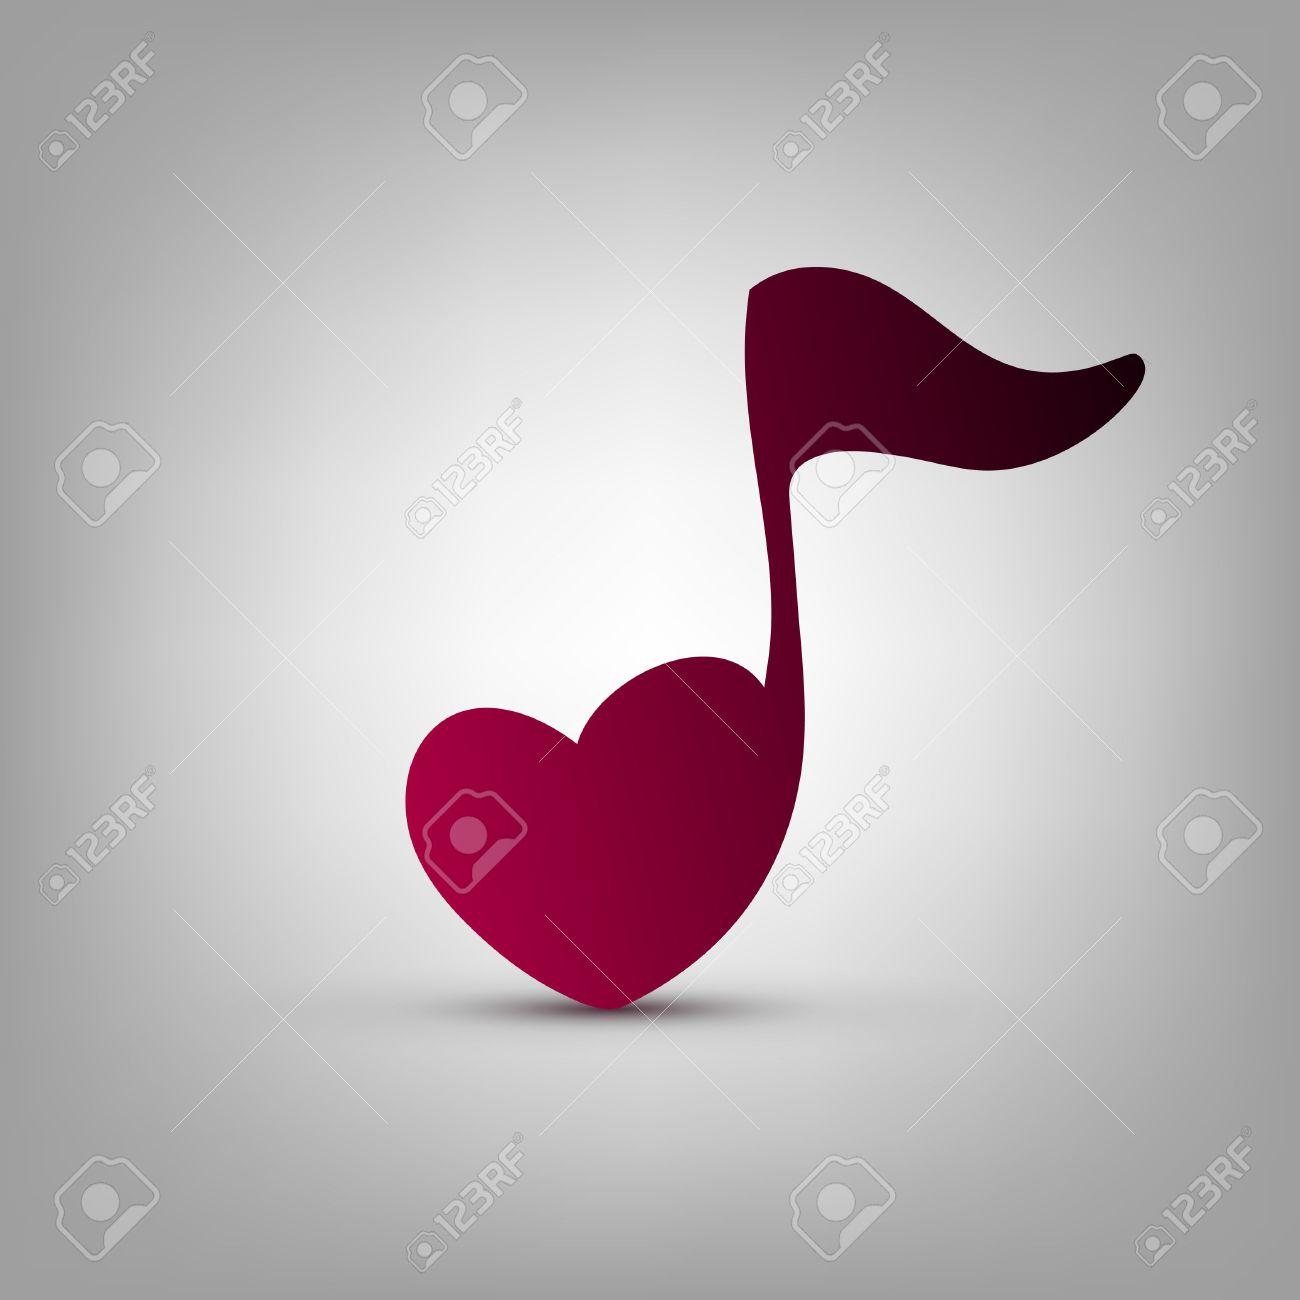 Musical note heart shape vector logo design template - 43623495